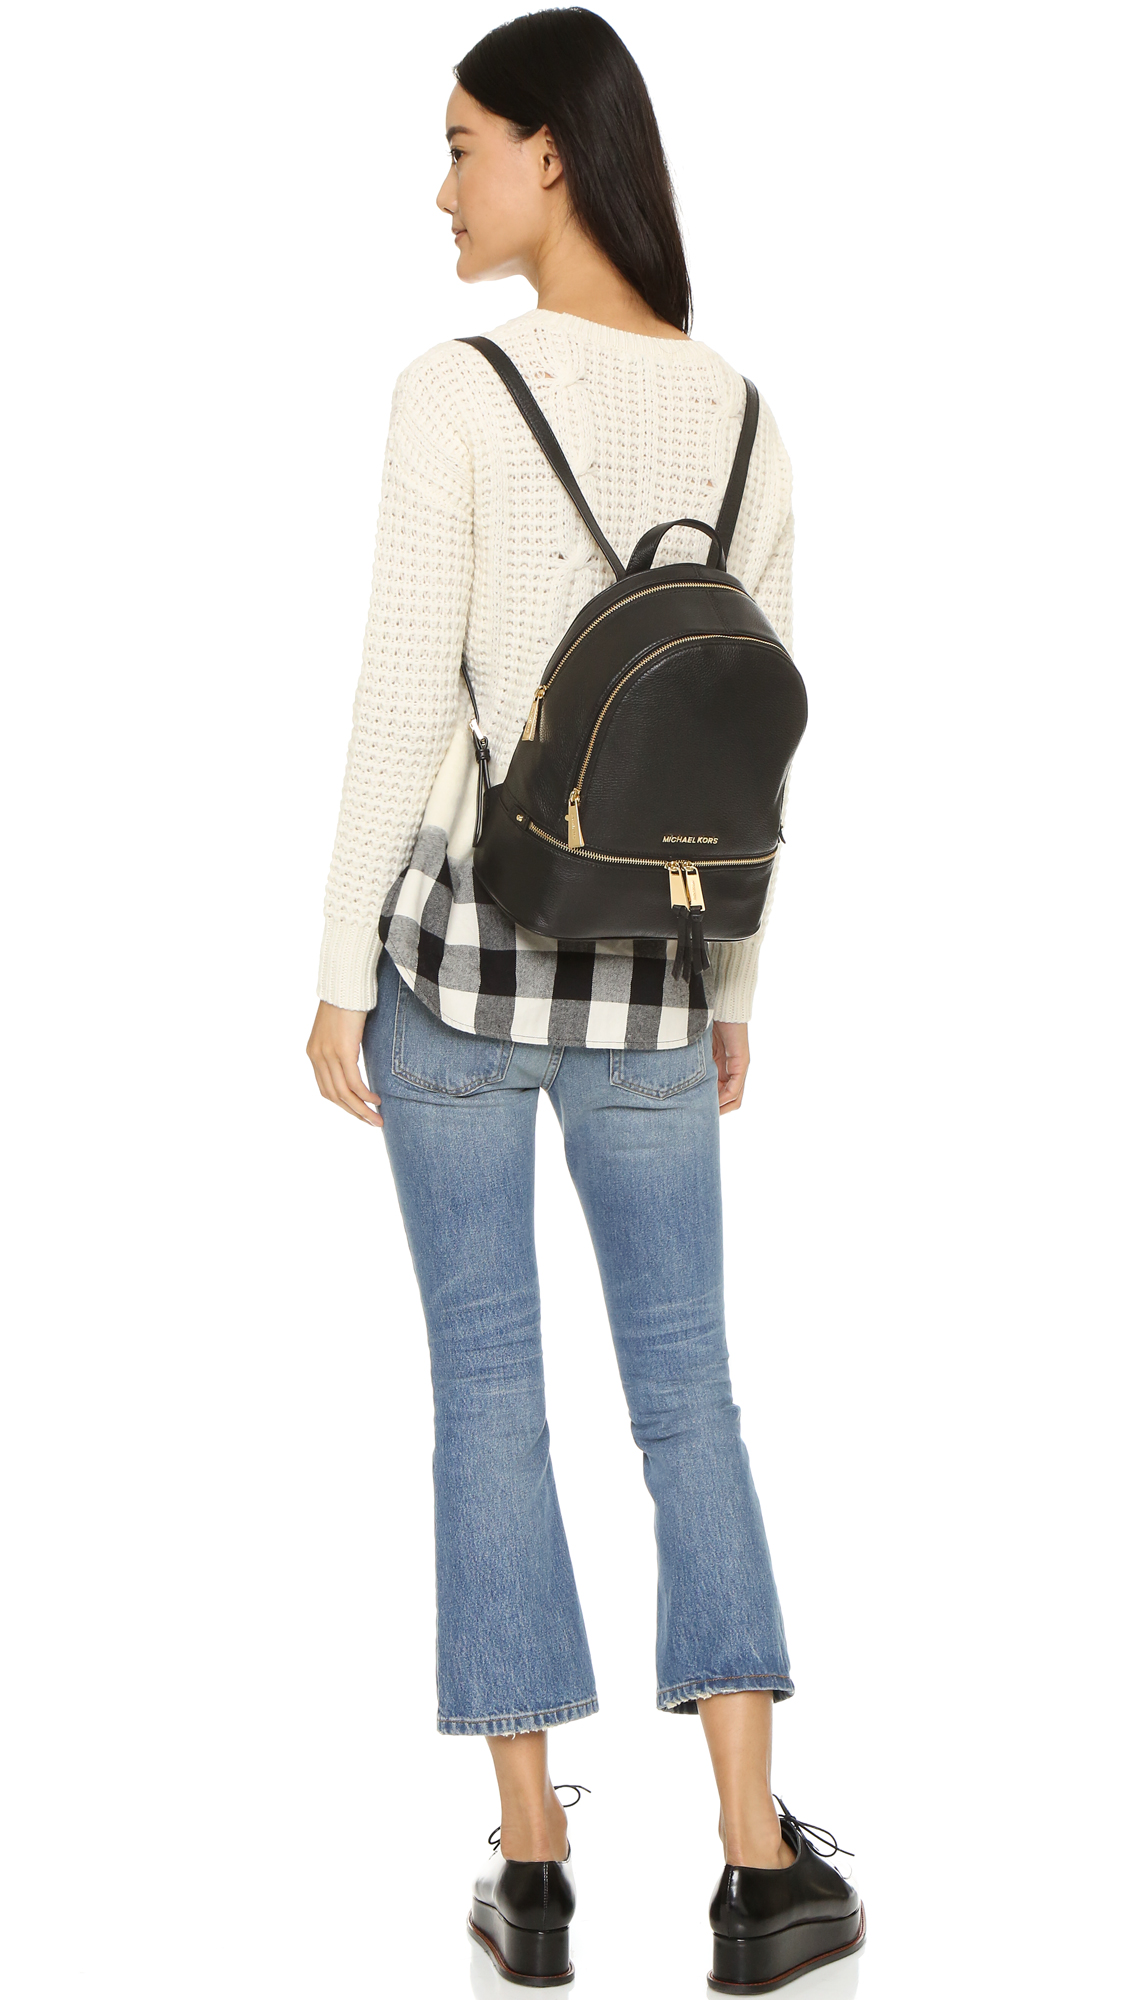 37562ae4d9c2f Buy michael kors small rhea backpack   OFF56% Discounted